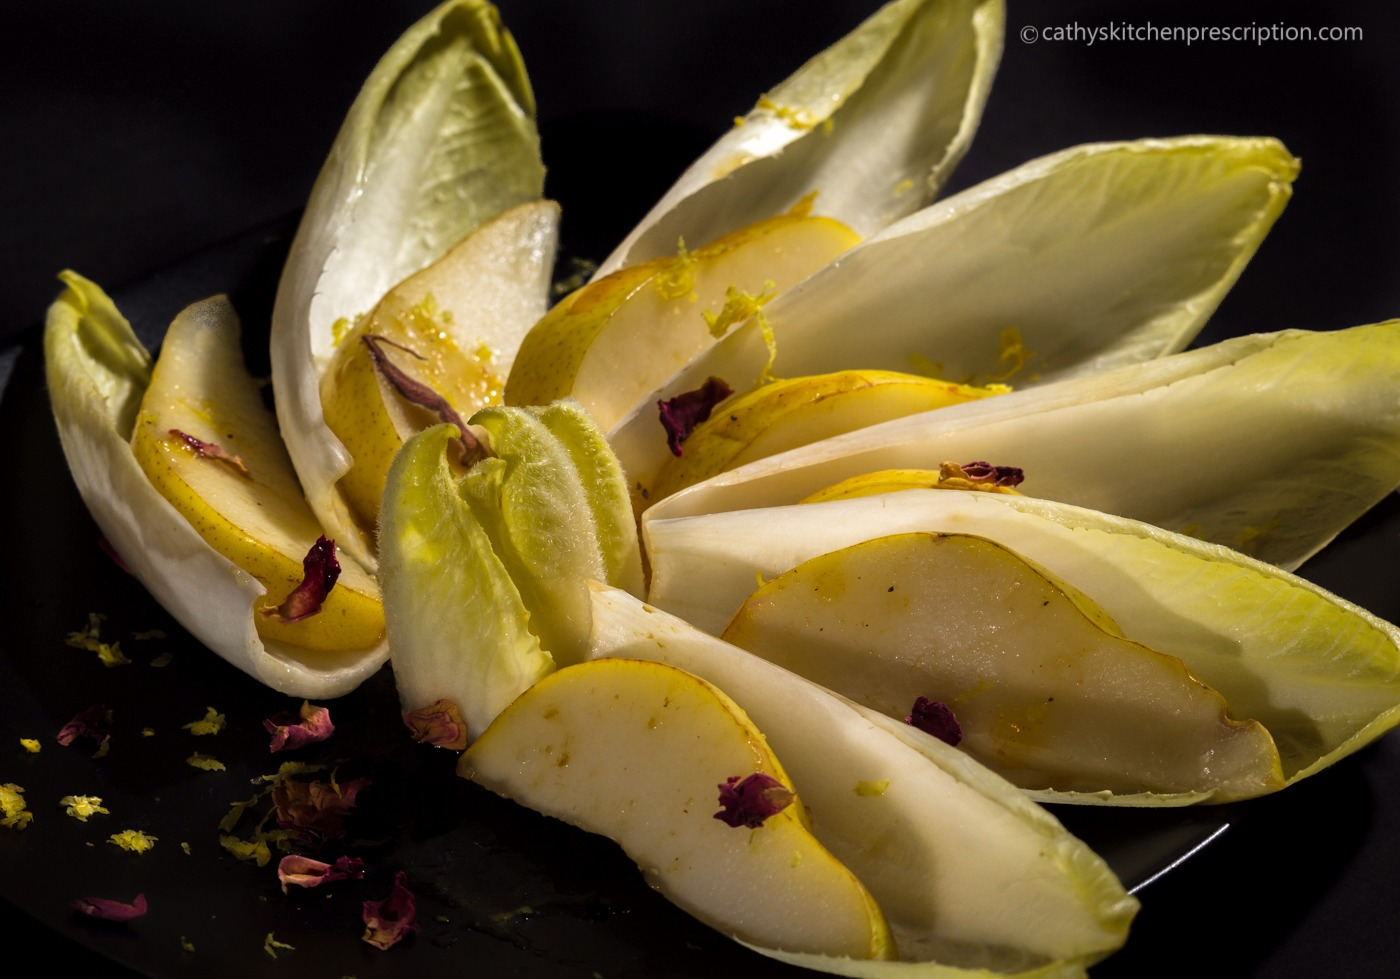 Moroccan pear & endive salad